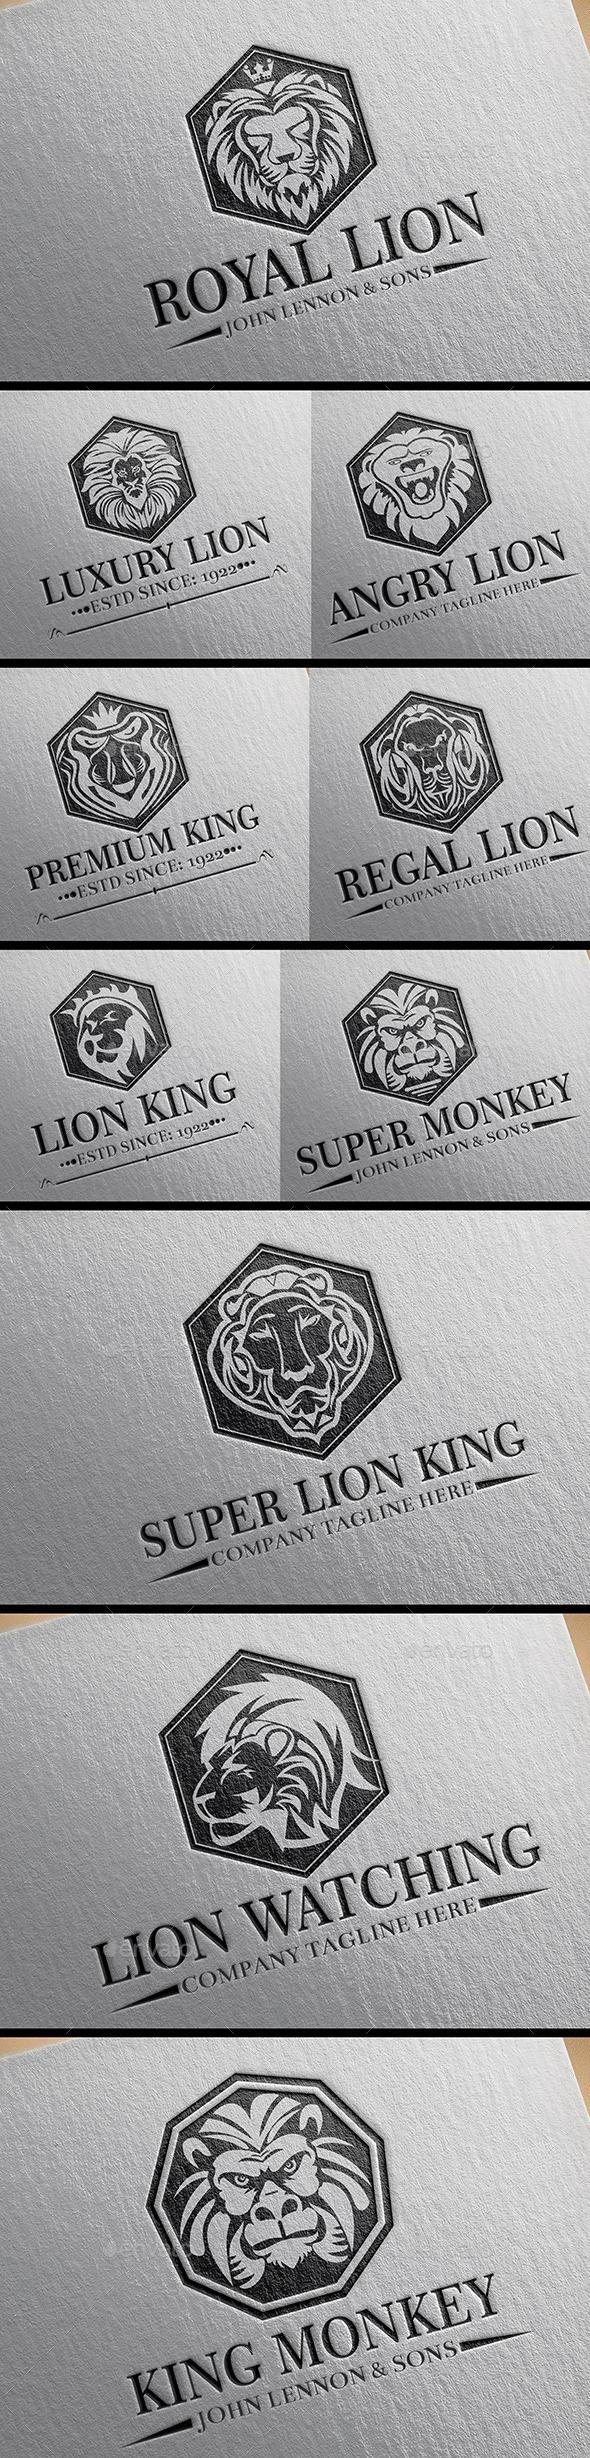 Heraldic Lion Crest Logos Vol 11